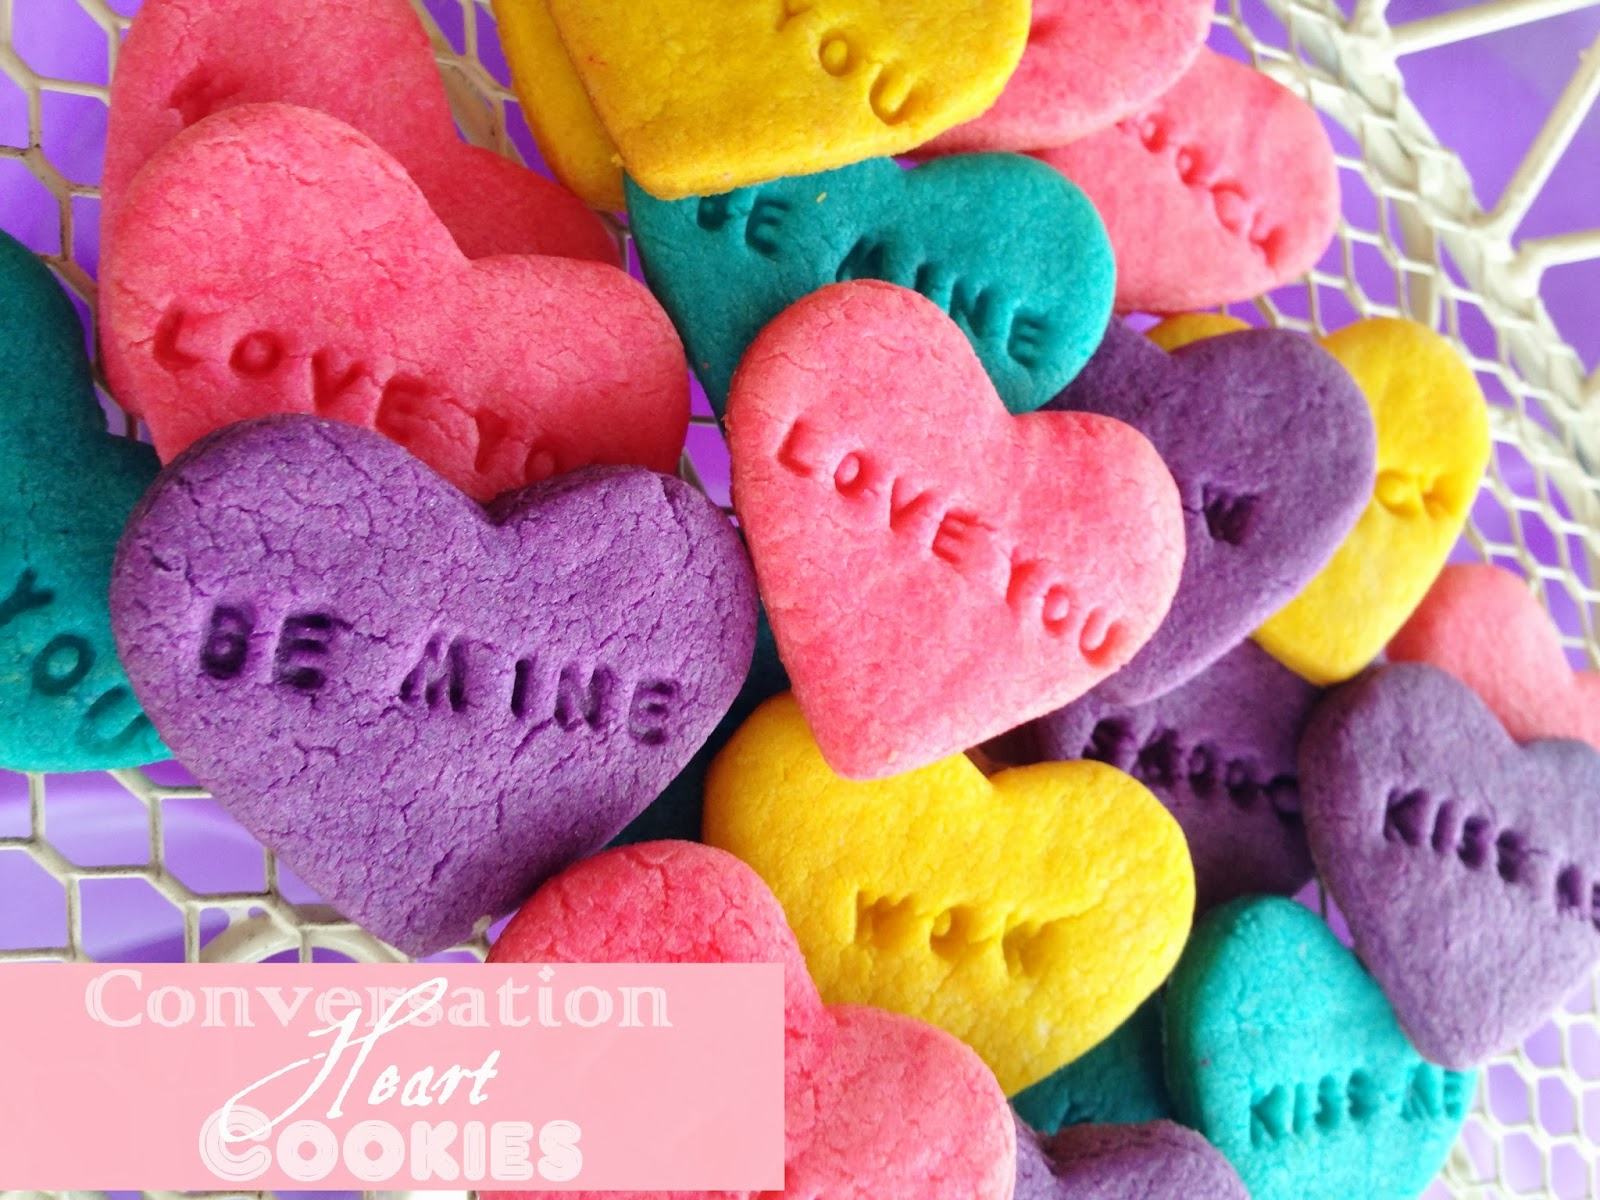 Conversation Heart Cookies - Purple Chocolat Home